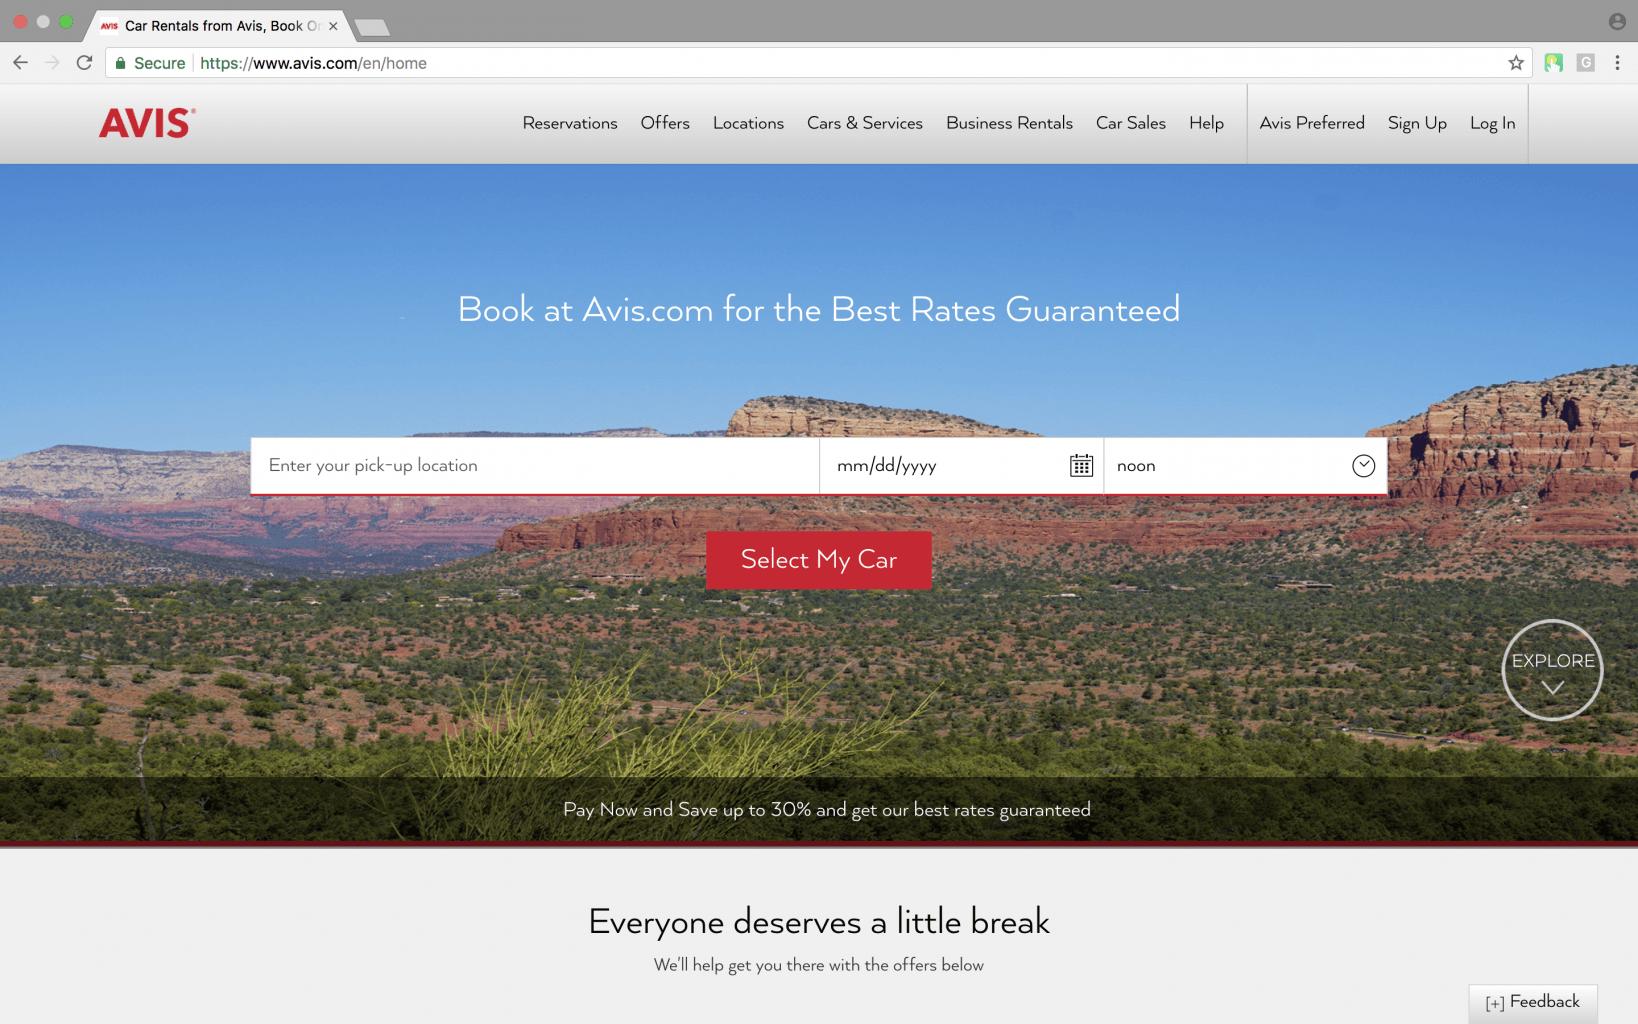 Avis car rental web application home page screenshot